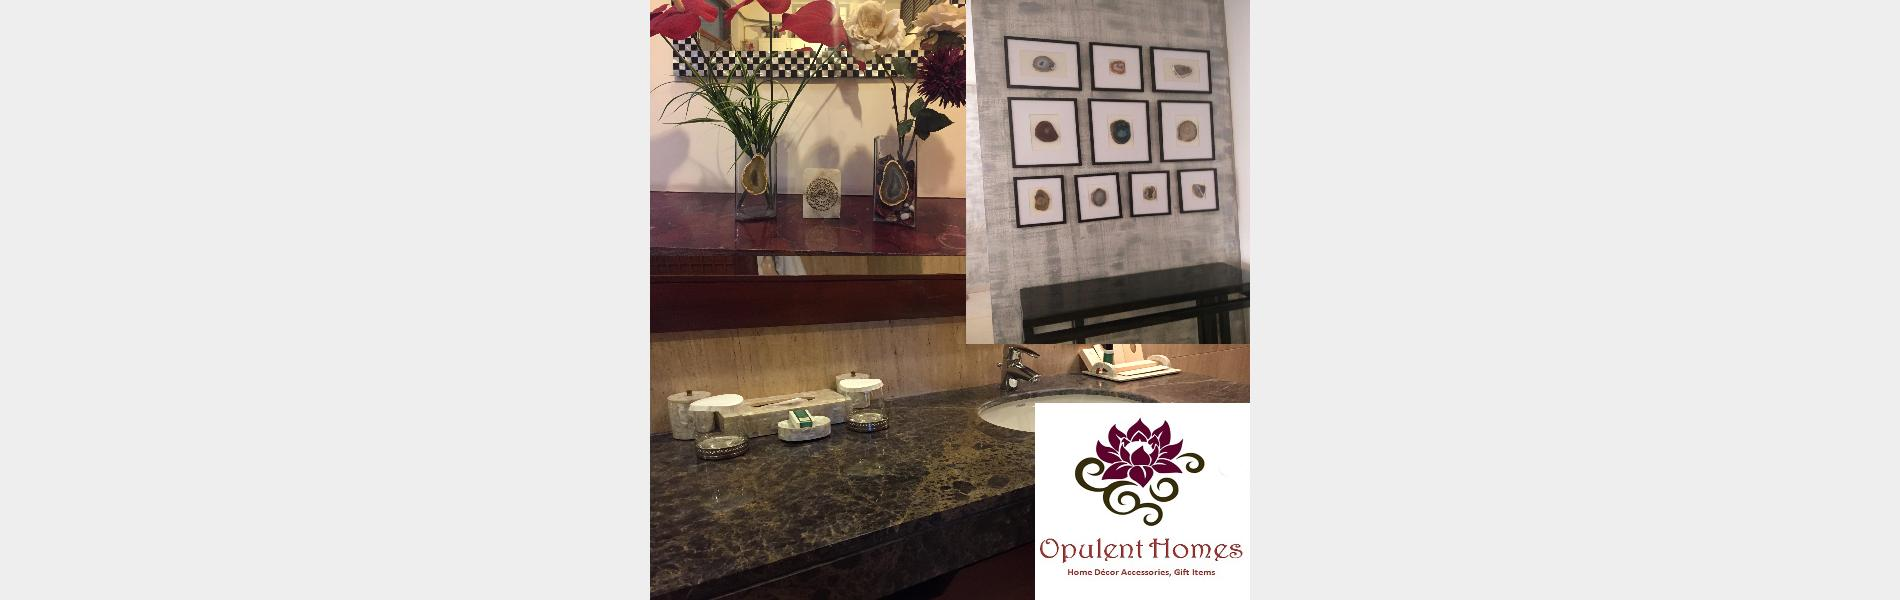 Opulent Homes